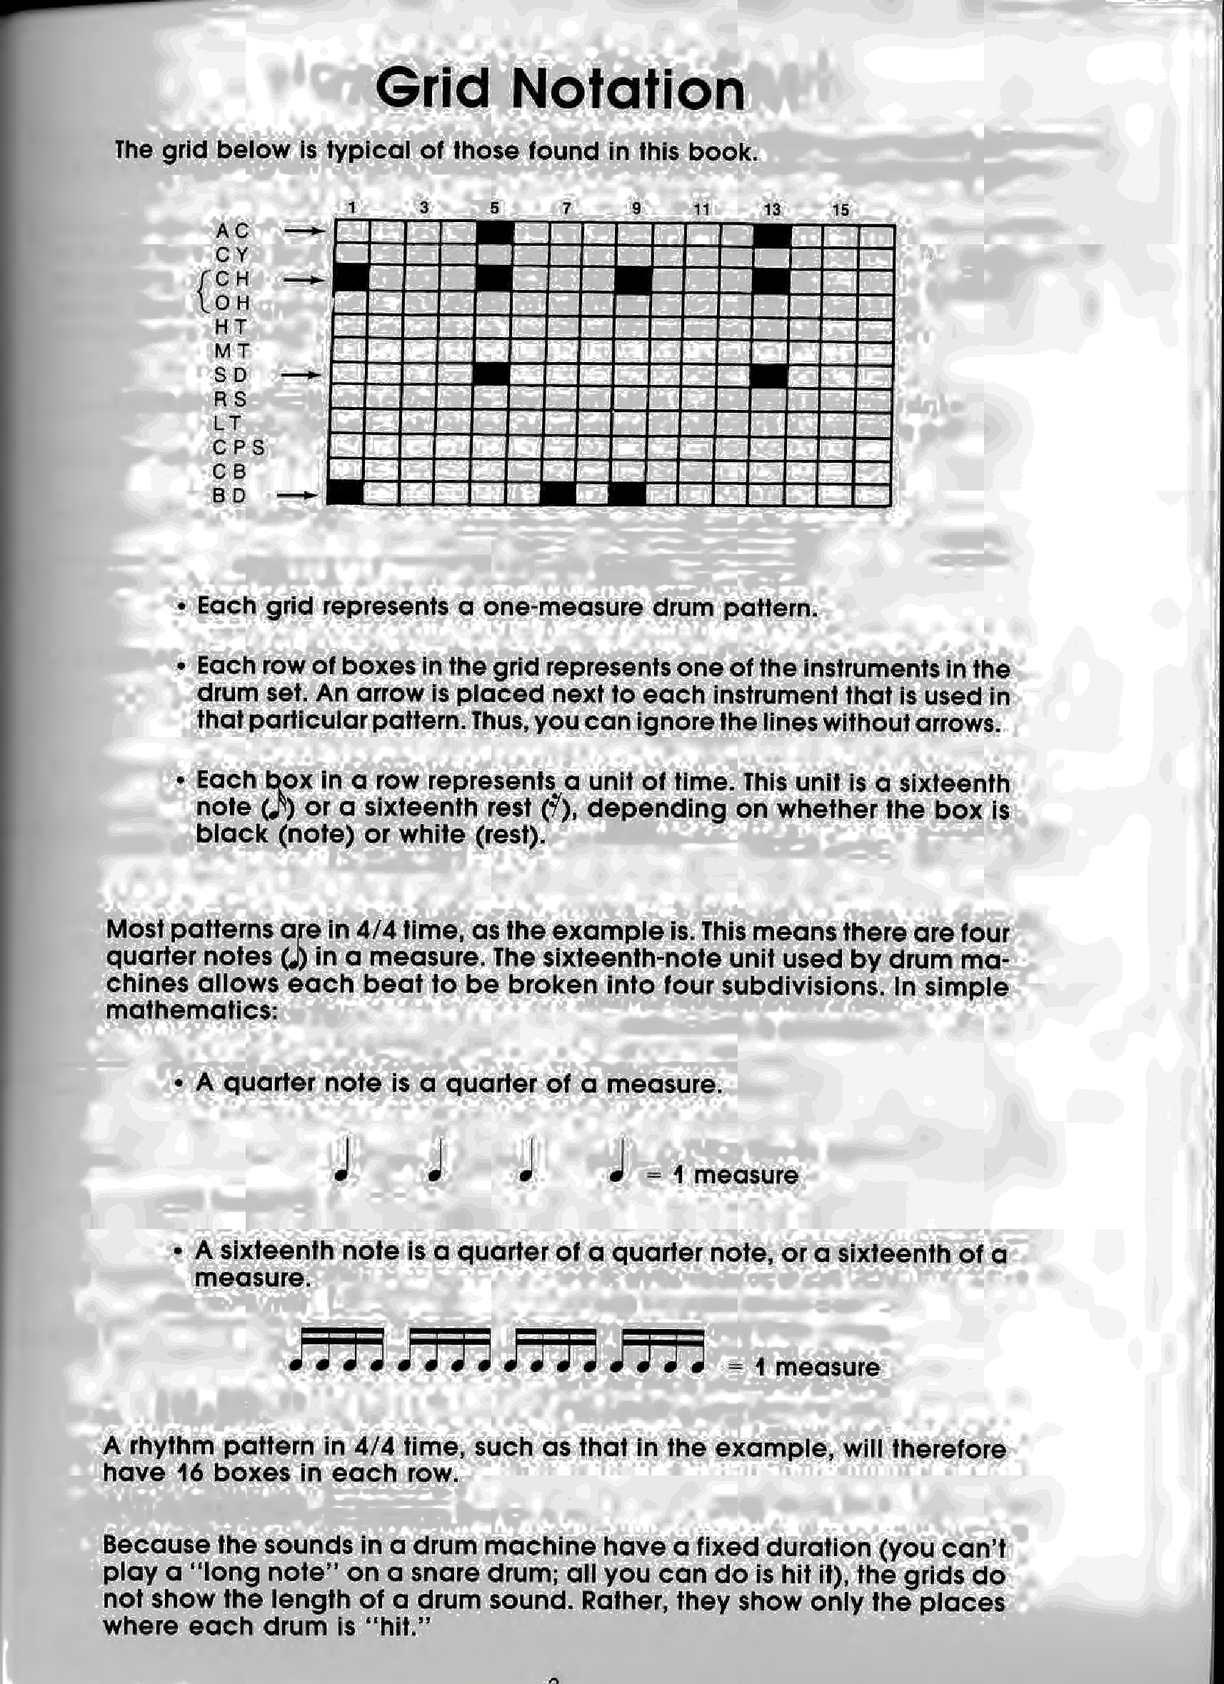 260 Drum Machine Patterns - CALAMEO Downloader